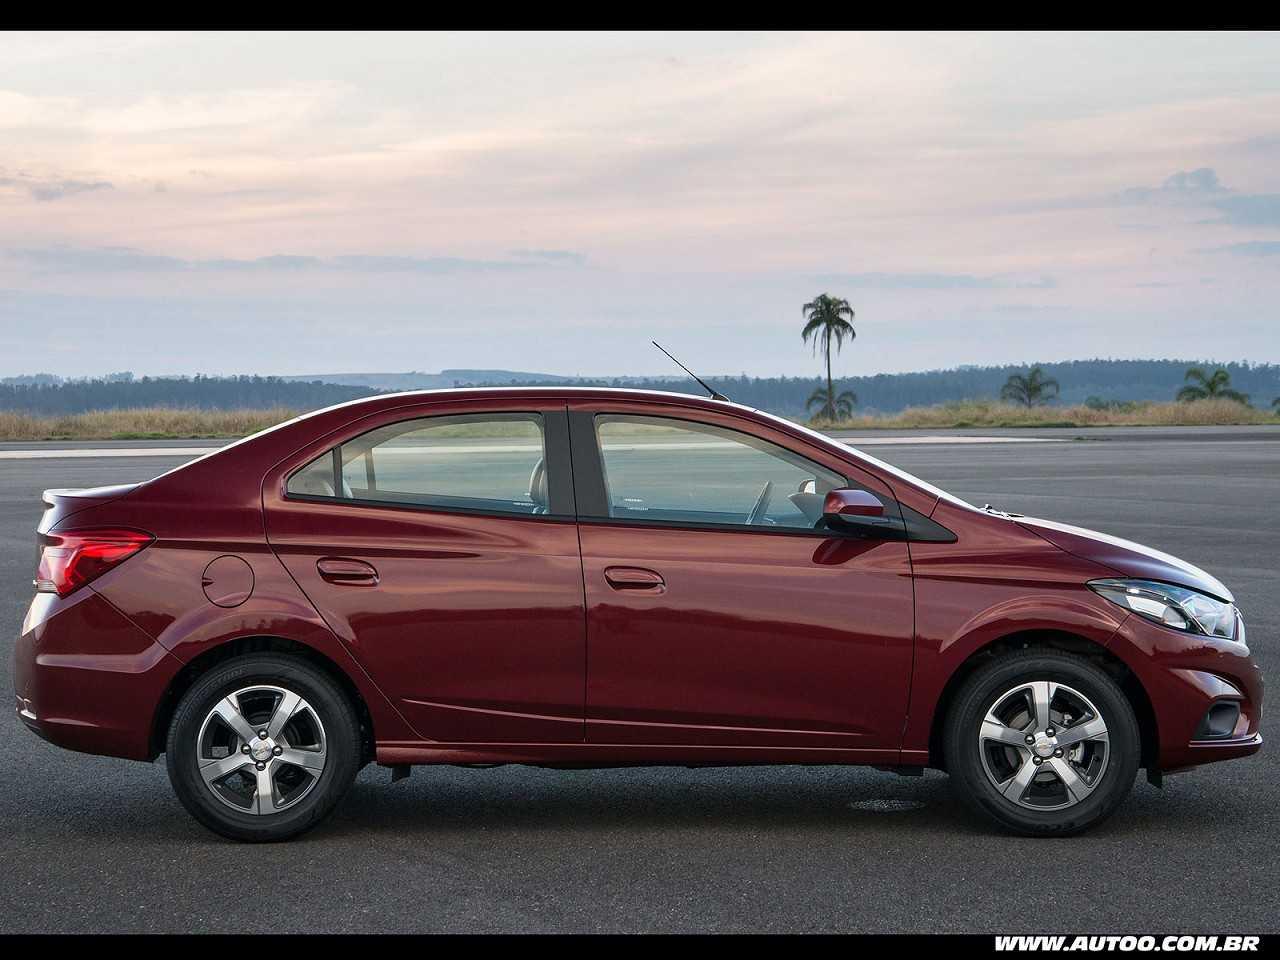 ChevroletPrisma 2017 - lateral